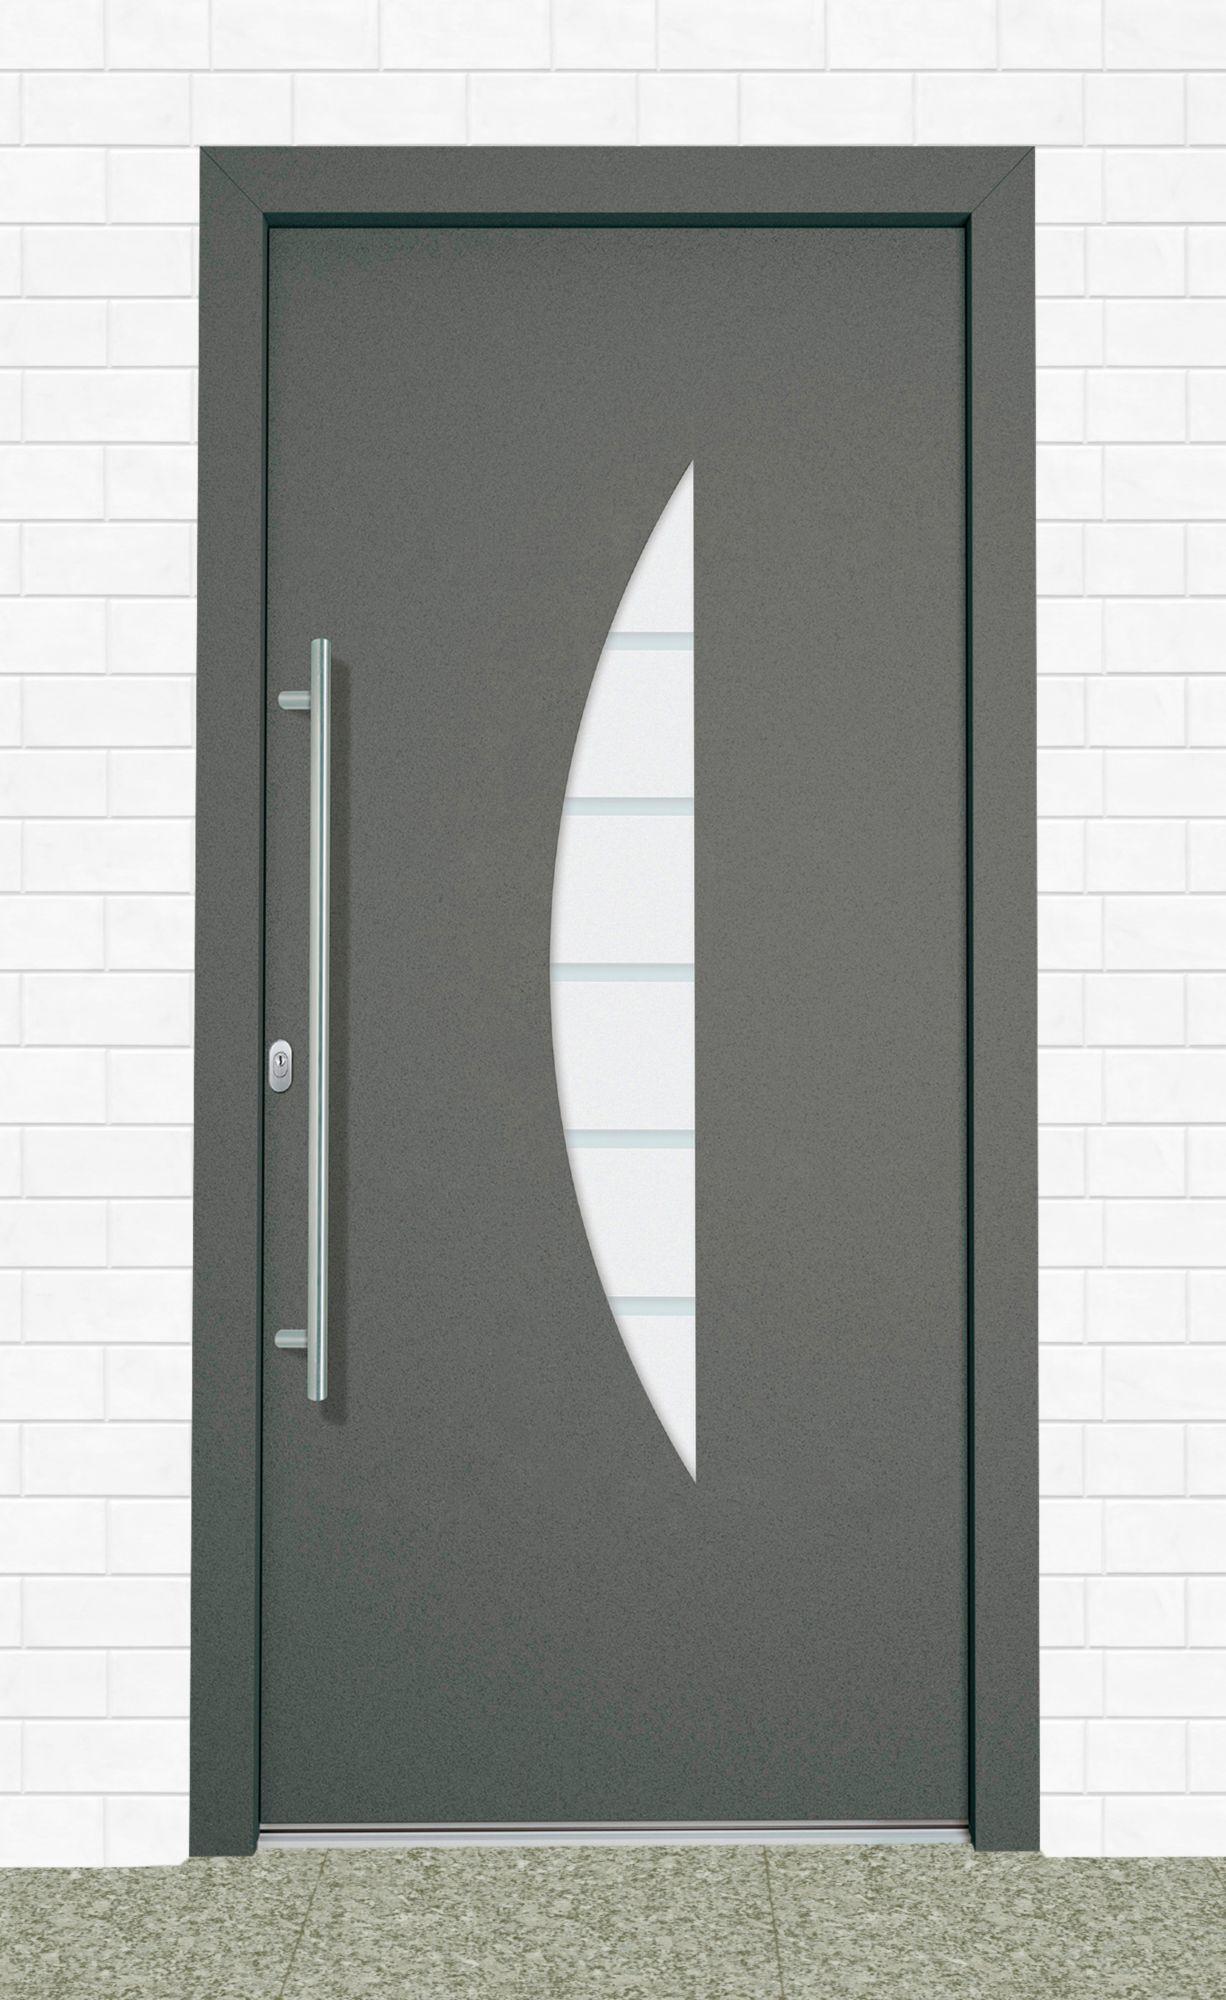 aluminium haust r malta t r nach ma anthrazit schwab versand haust ren. Black Bedroom Furniture Sets. Home Design Ideas